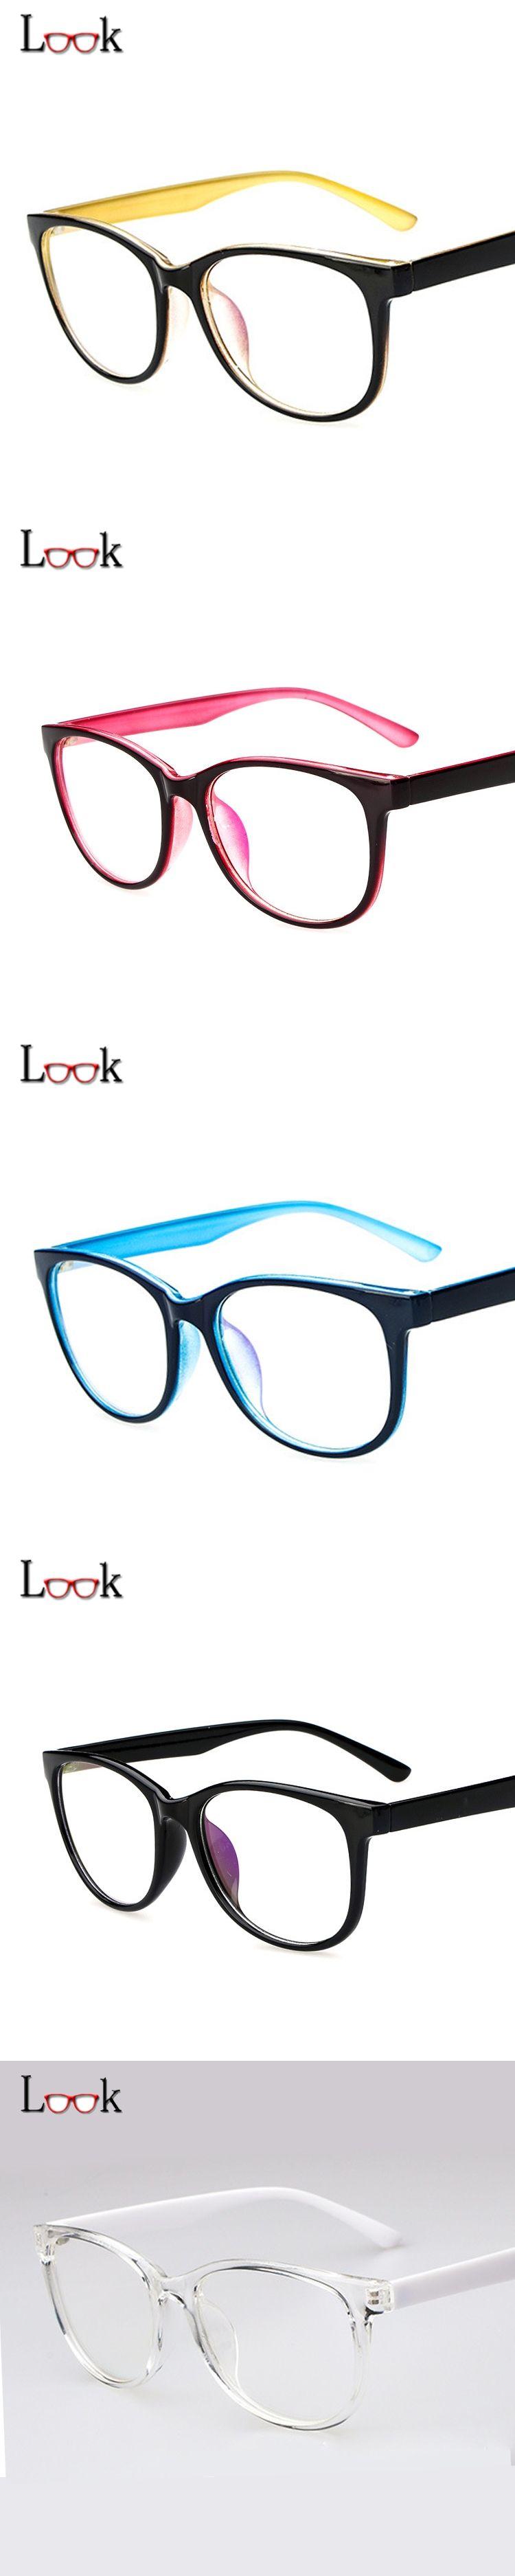 ef454709a70b 2017 Fashion Ultra Light Can Be Bent Optical Glasses Frame Women Men Clear  Computer Glasses Prescription